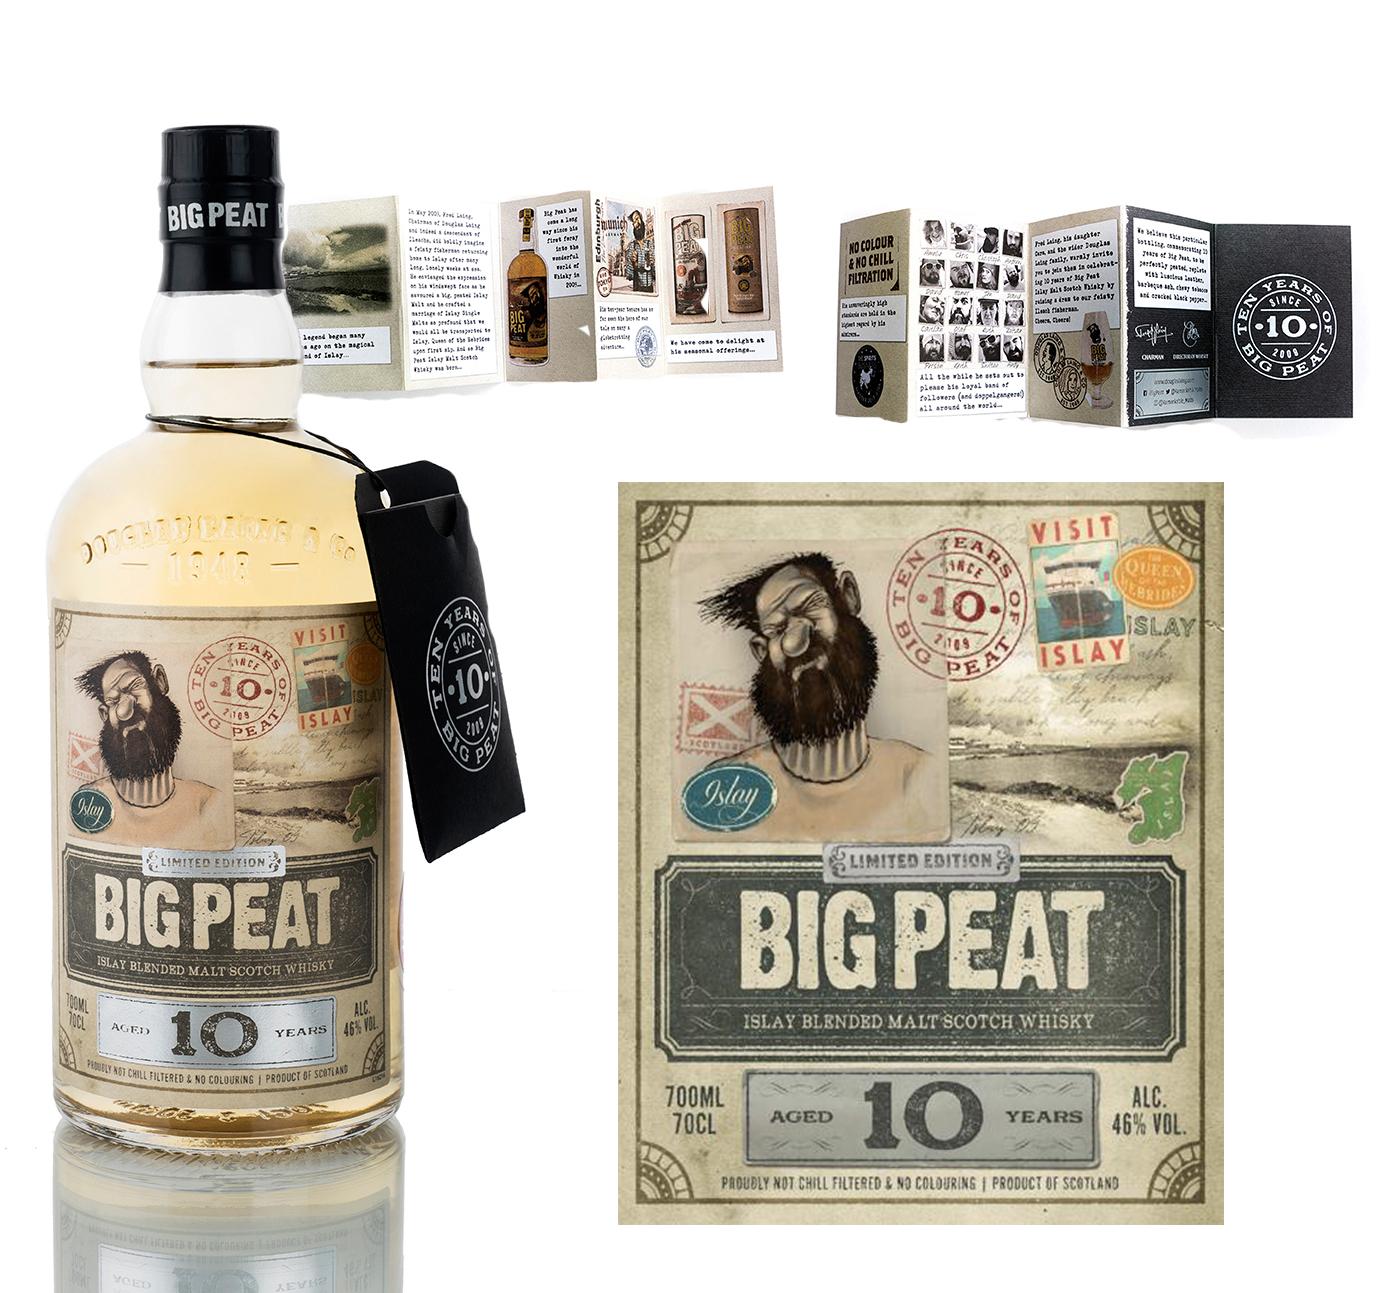 Big Peat viert verjaardag met een 10 jaar oude limited edition fles + etiket